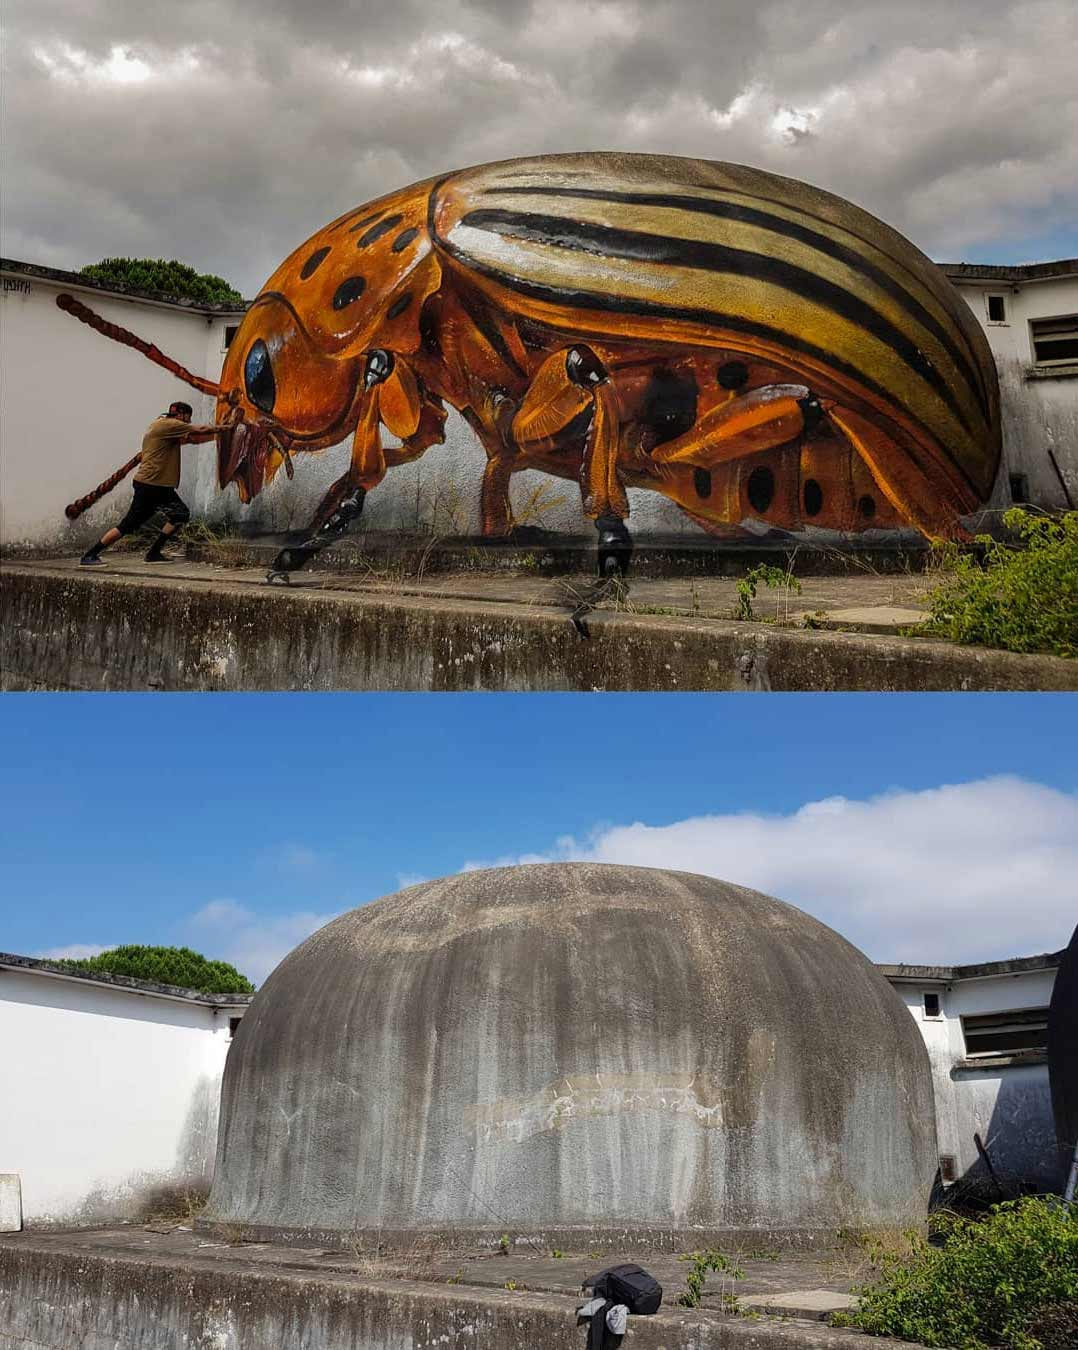 Anamorphe Riesen-Insekten von Odeith Odeith-anamorphe-insekten_07